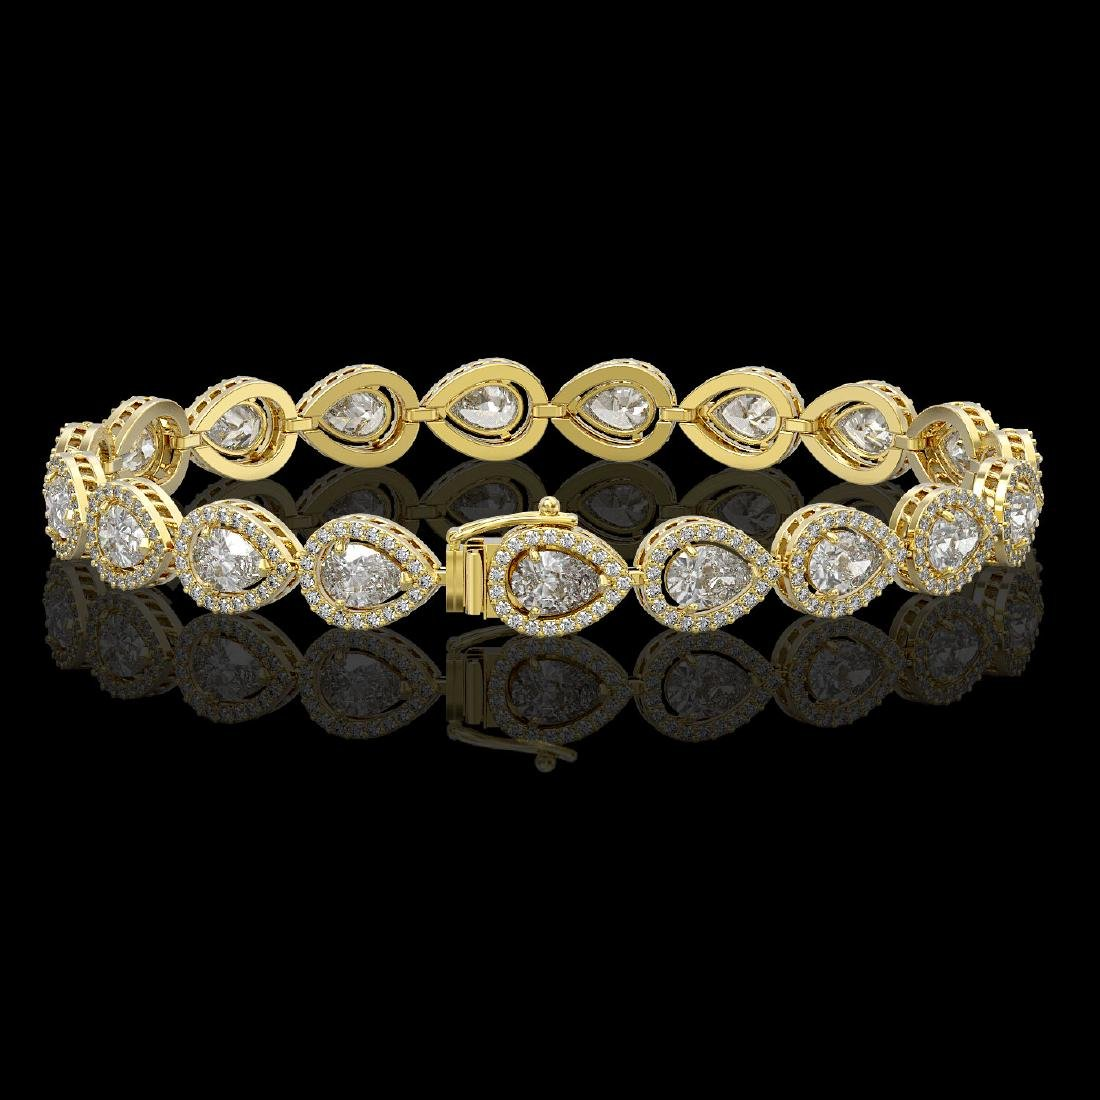 12.38 CTW Pear Diamond Designer Bracelet 18K Yellow - 2